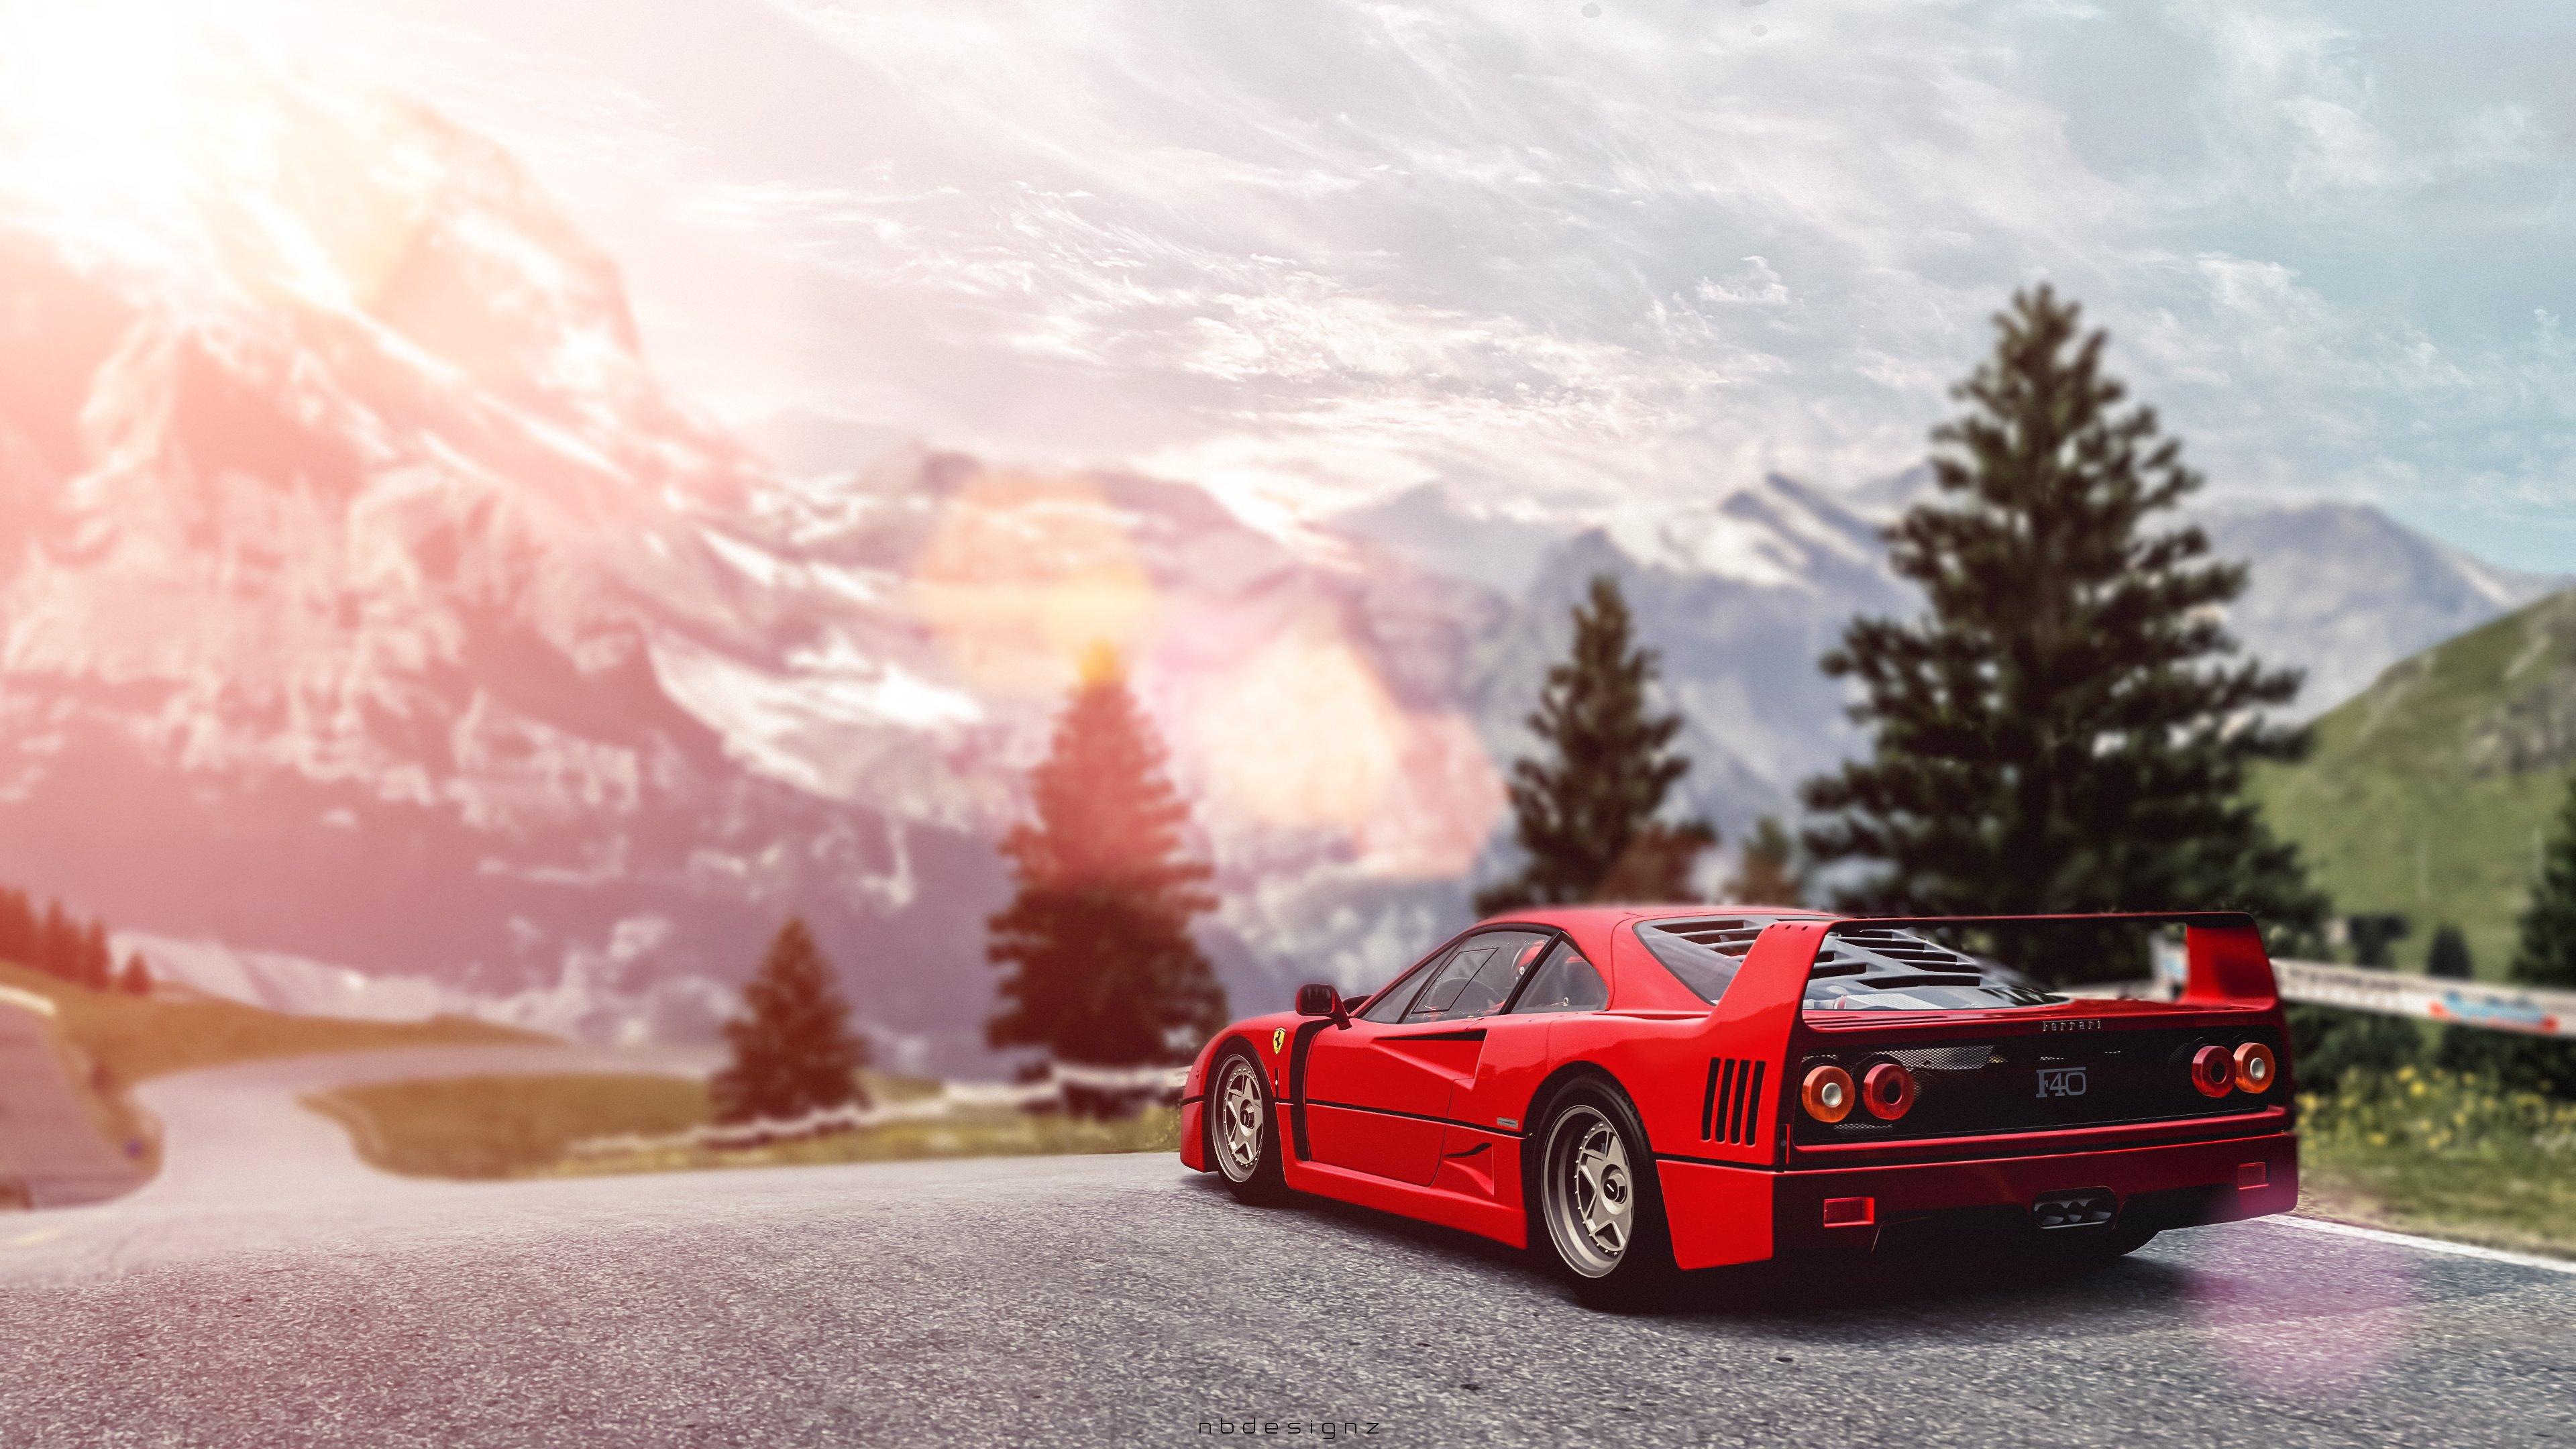 Ferrari F40 Gran Turismo 6 Nbdesignz Wallpaper 3840x2160